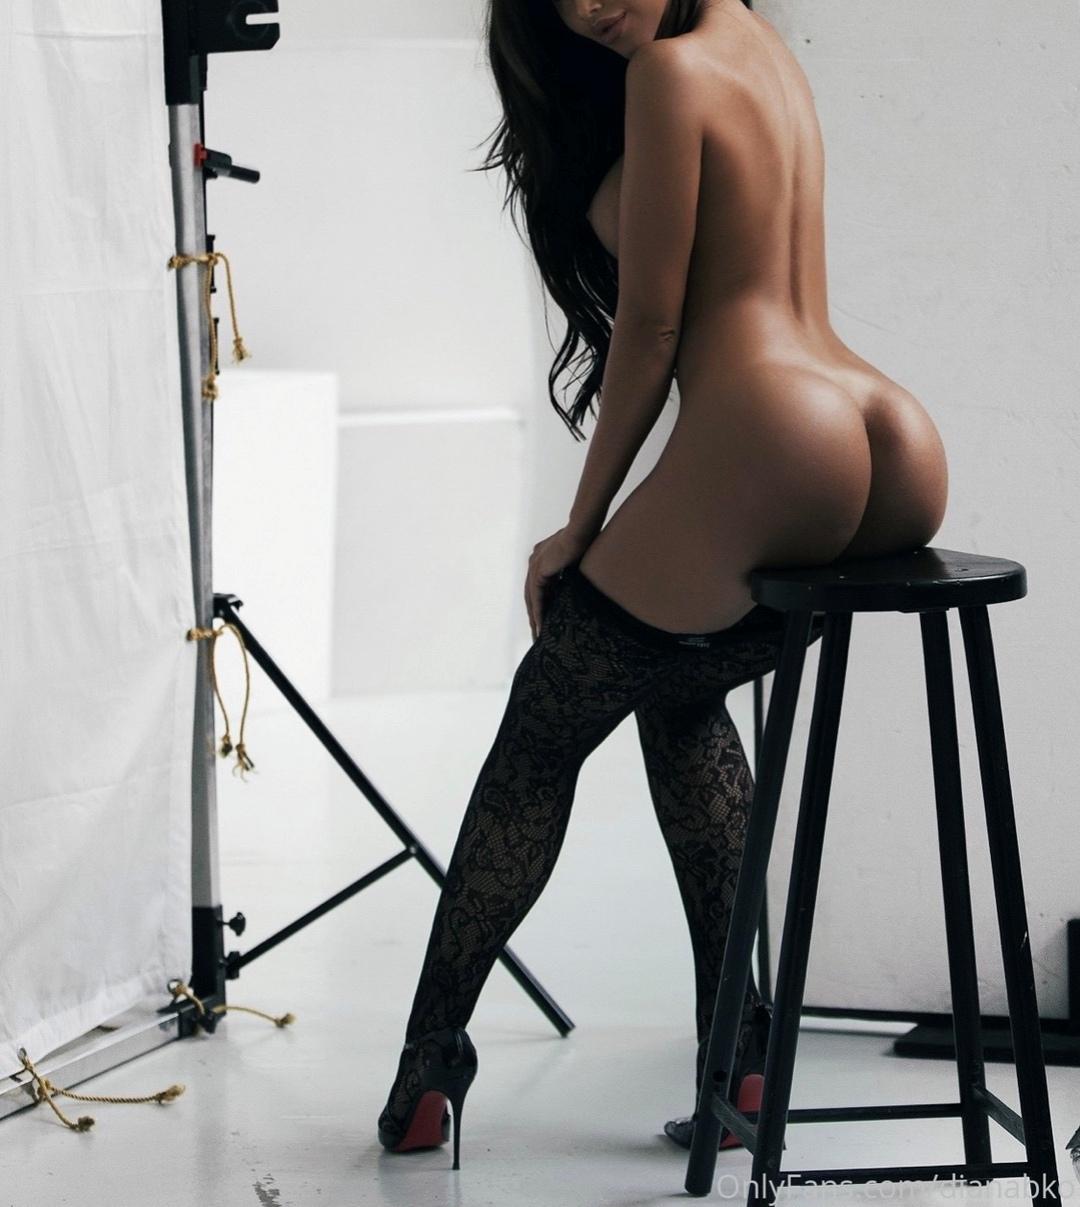 Diana Bako Dianabko Onlyfans Nudes Leaks 0016